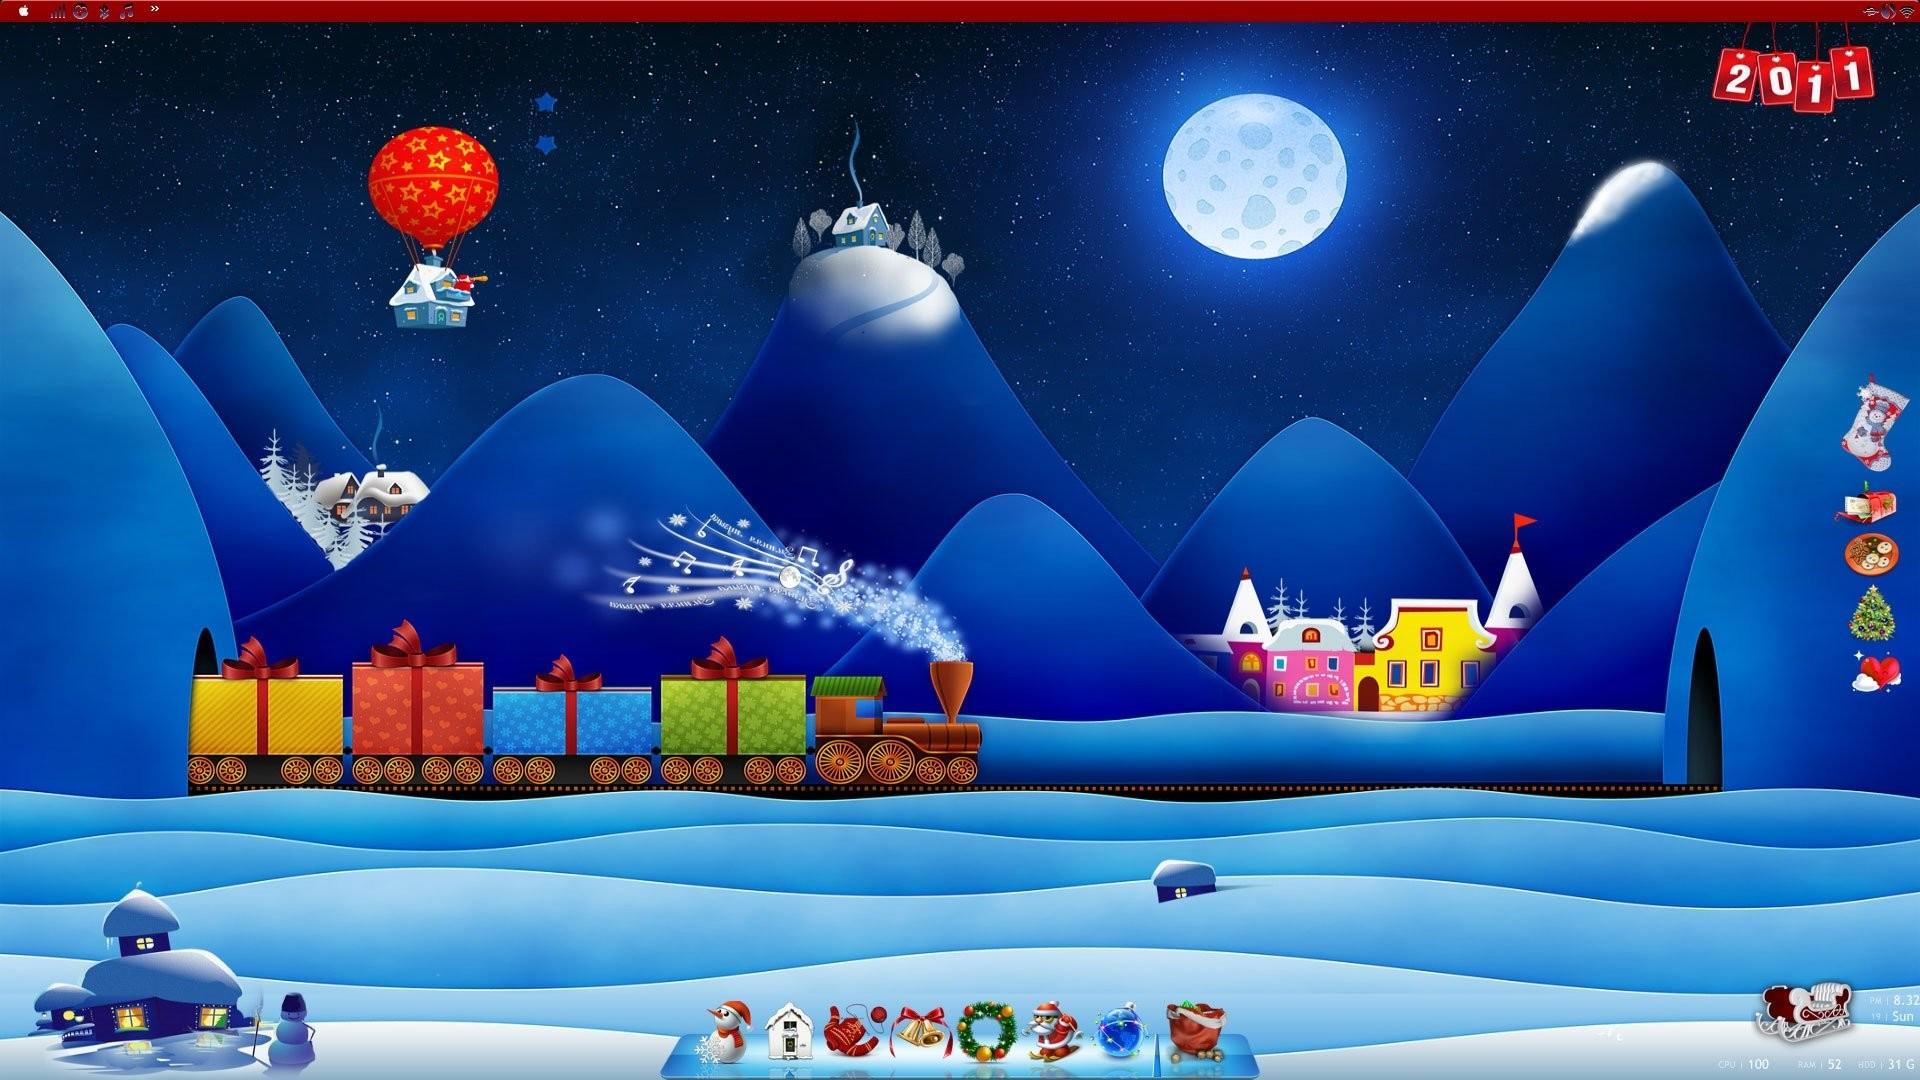 Christmas Train 762526. SHARE. TAGS: Christian Phone …